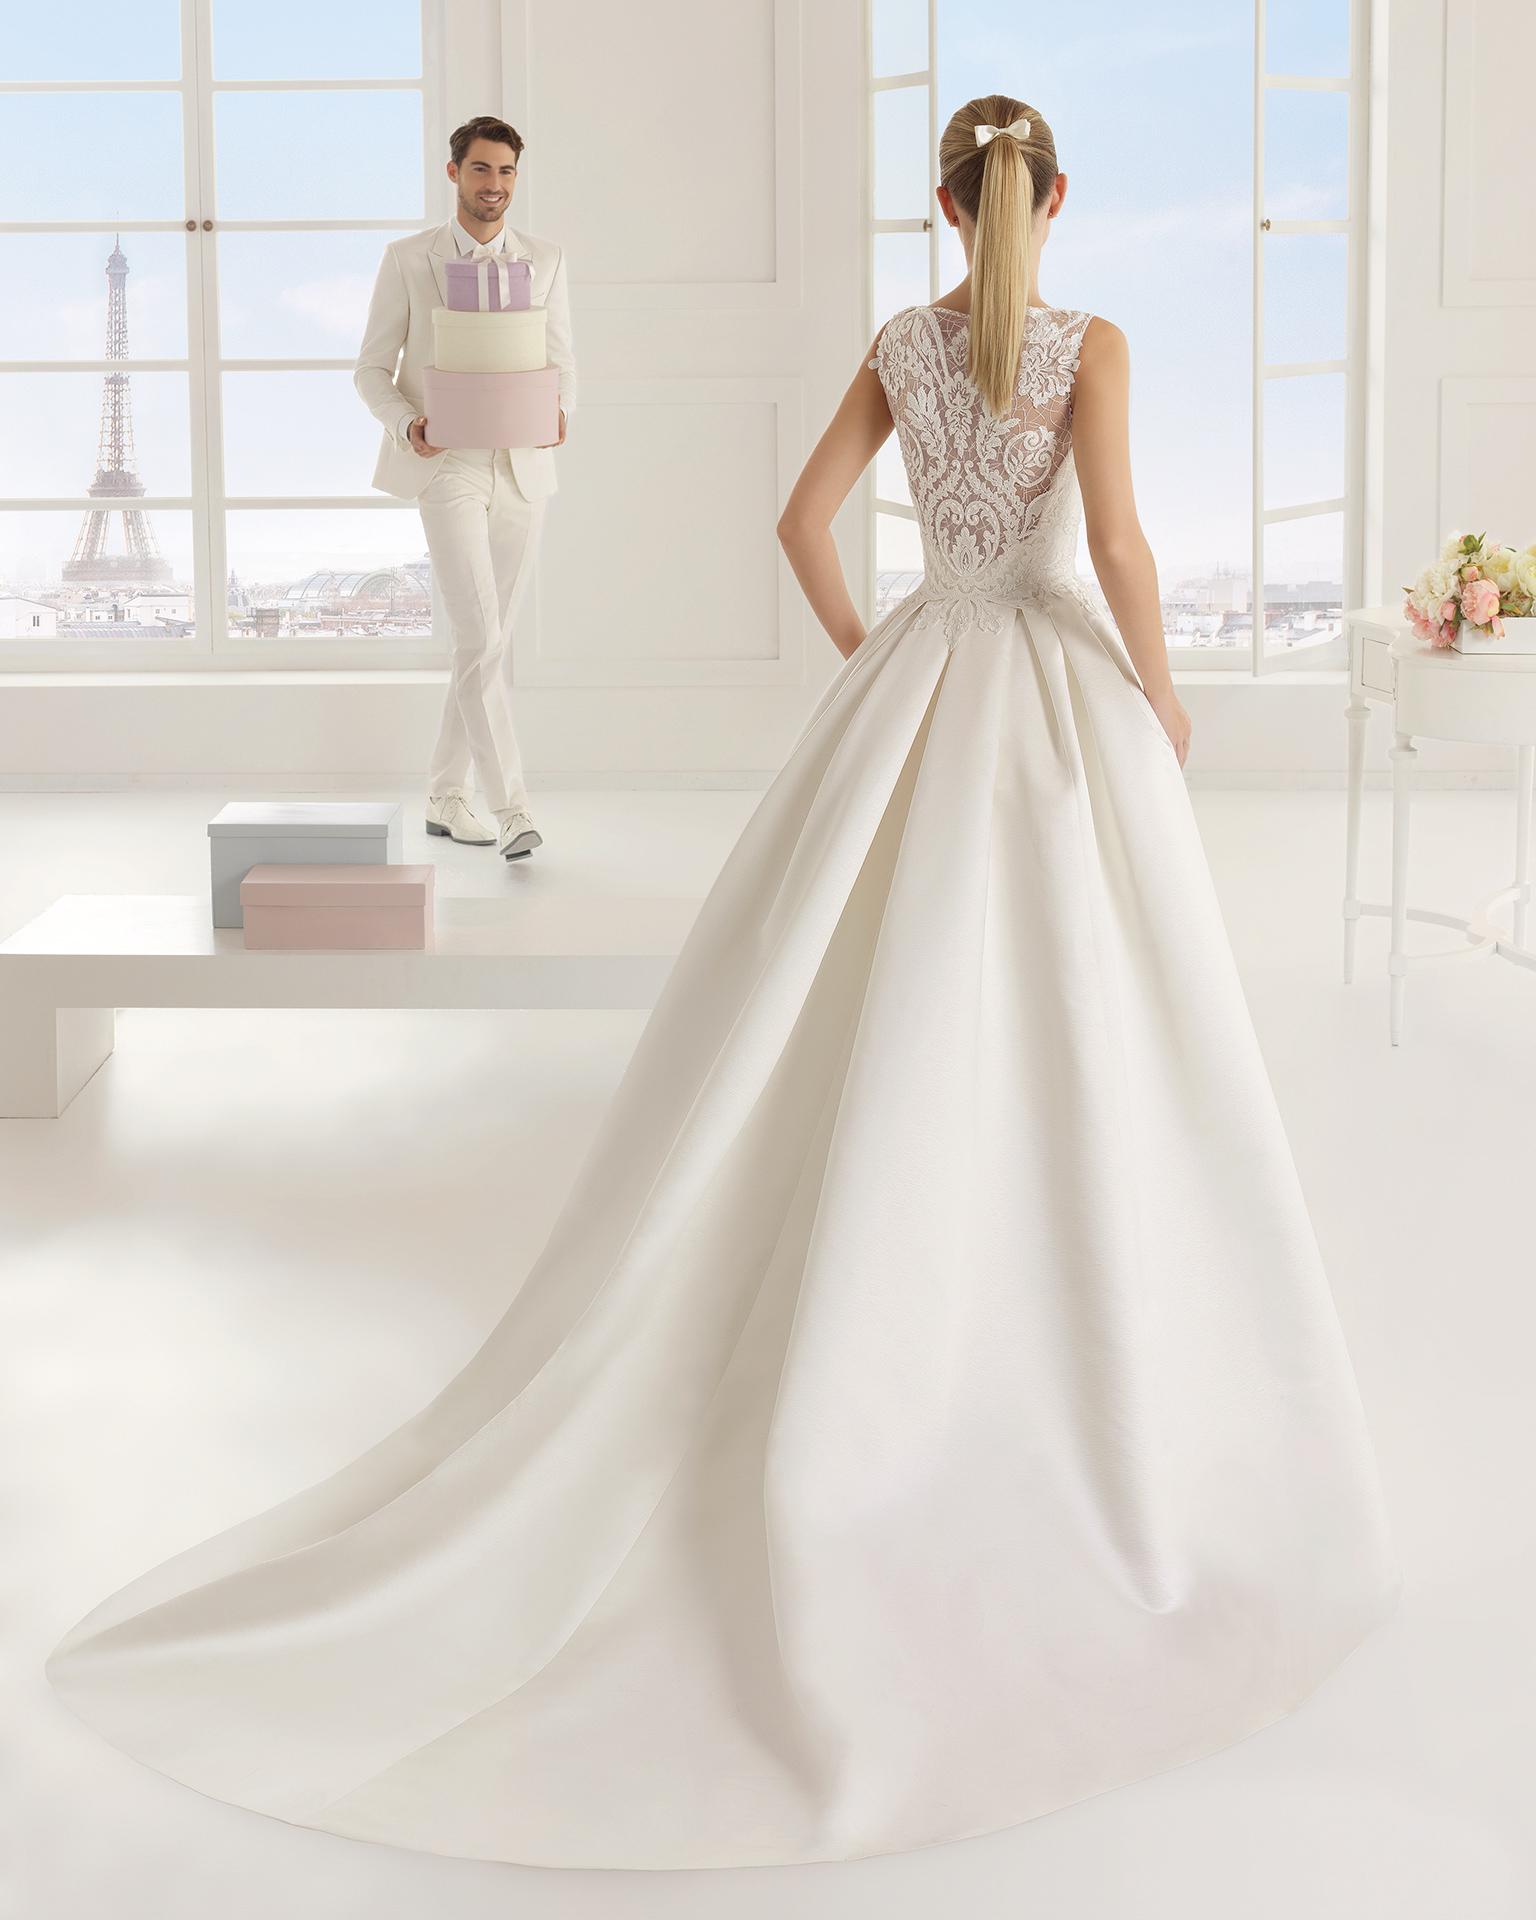 Eric (38, микадо/кружево/бисер, natural) Свадебное платье Rosa Clara в Одессе. Свадебный салон Скоро Свадьба.